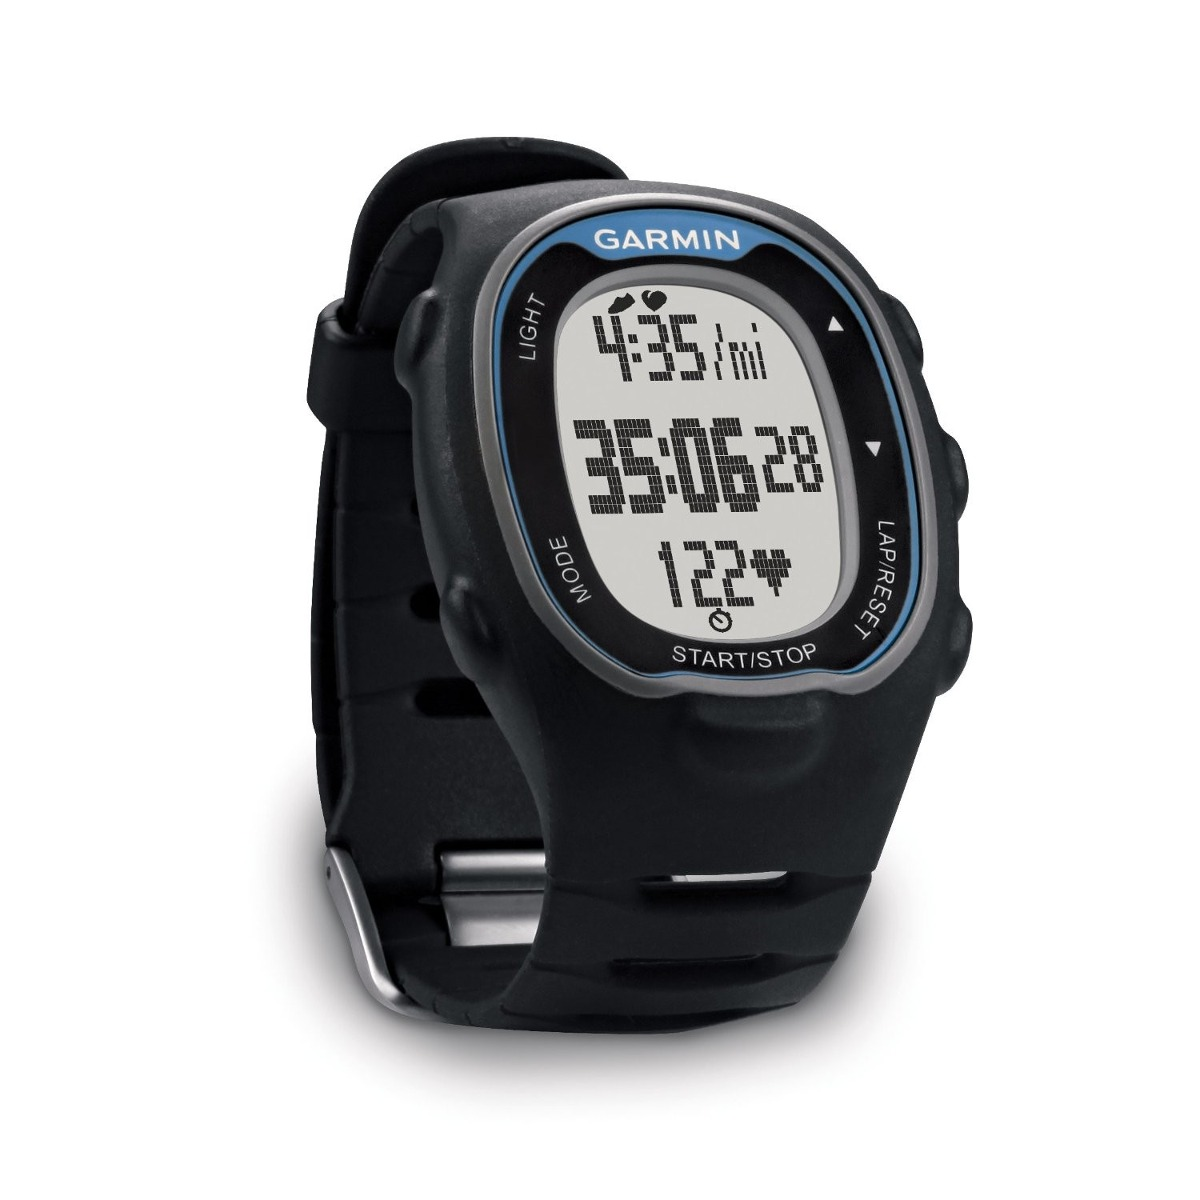 Tb Reloj Garmin Fr70 Fitness Watch With Heart-rate Monitor ...